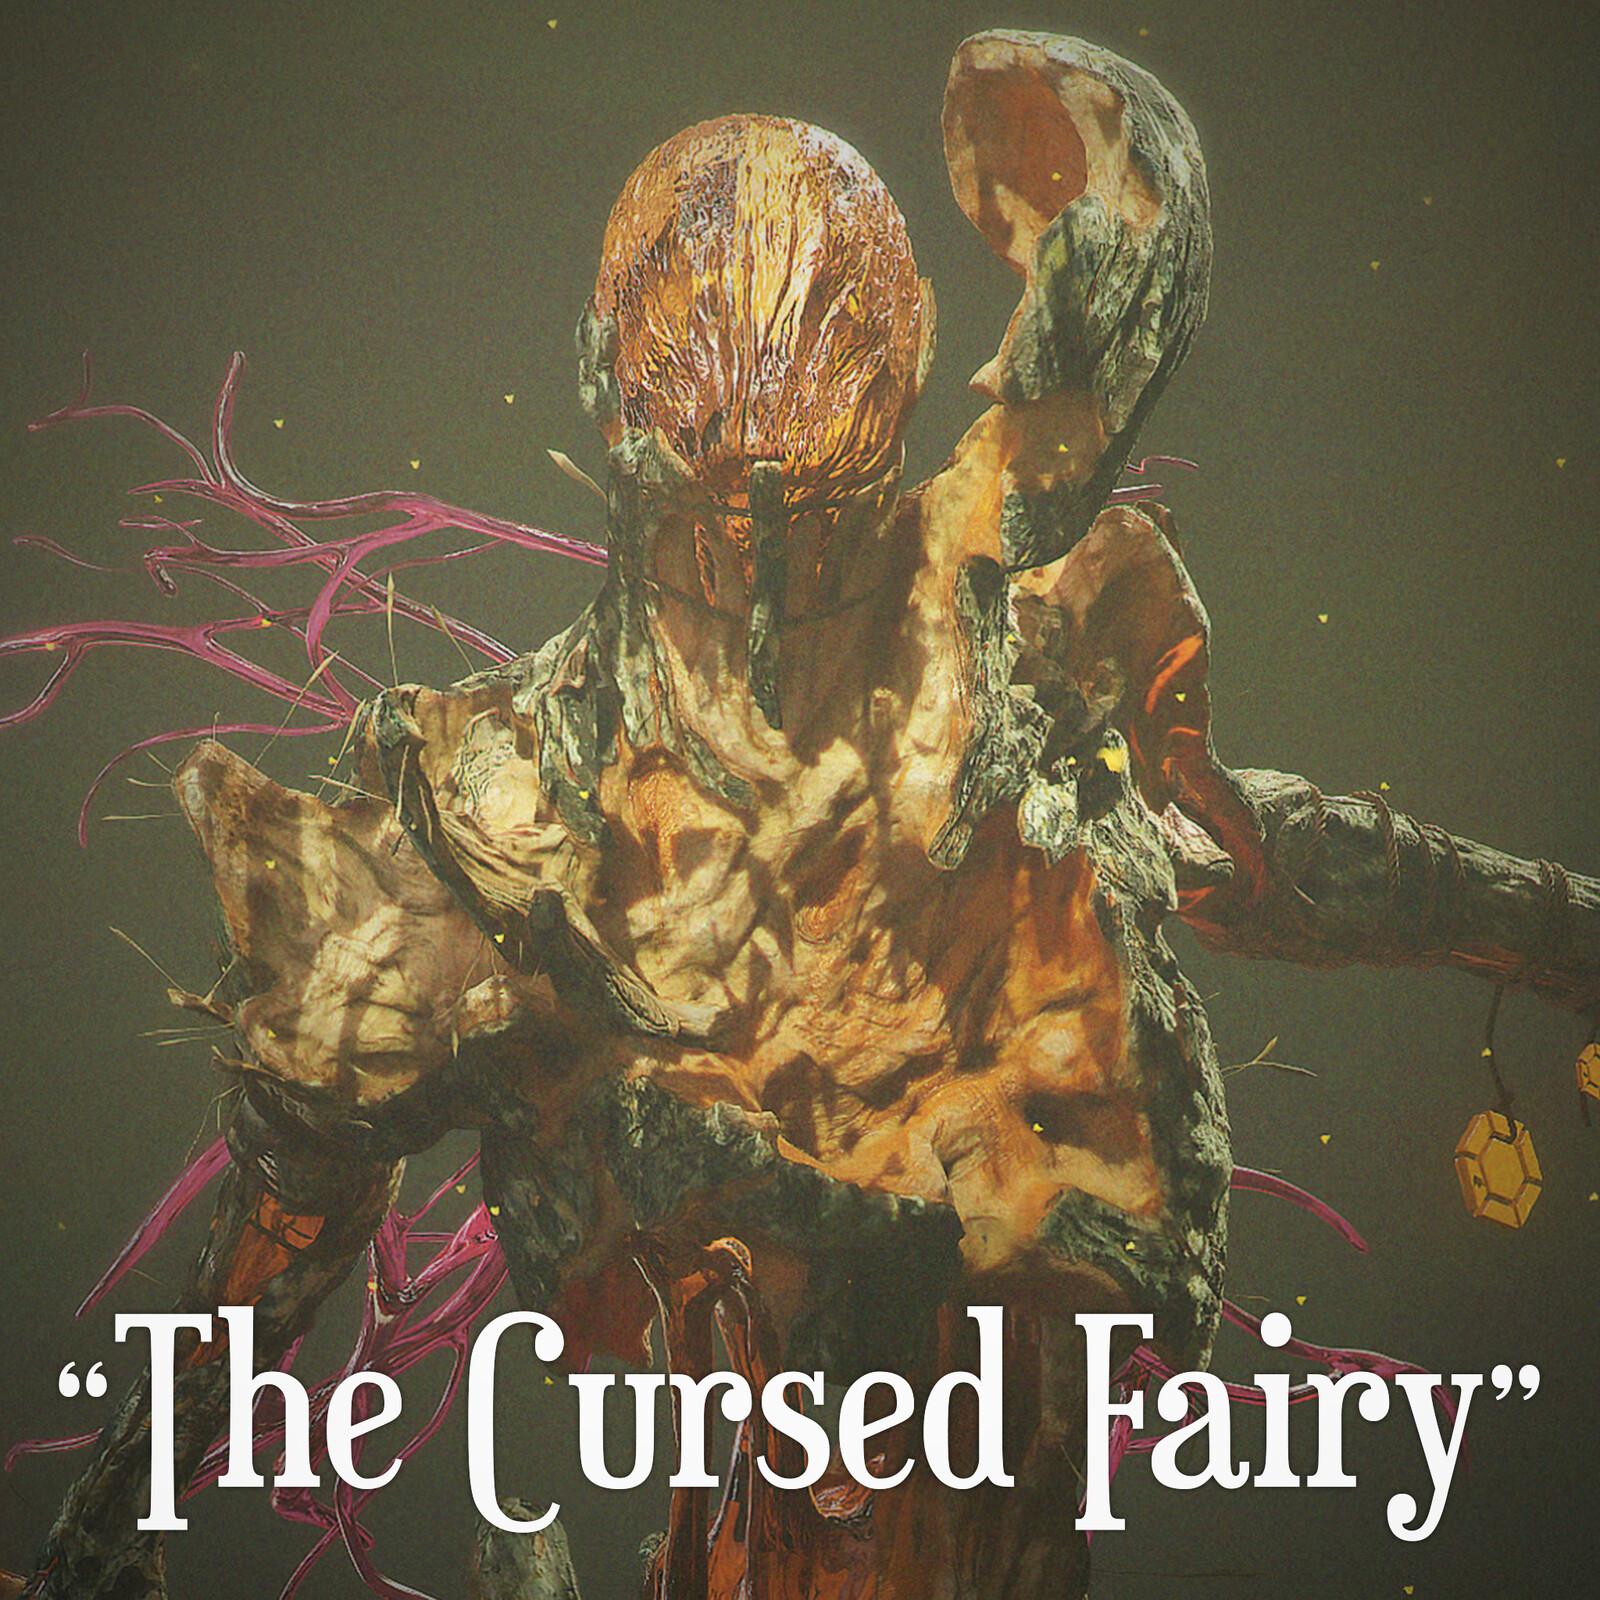 The Cursed Fairy